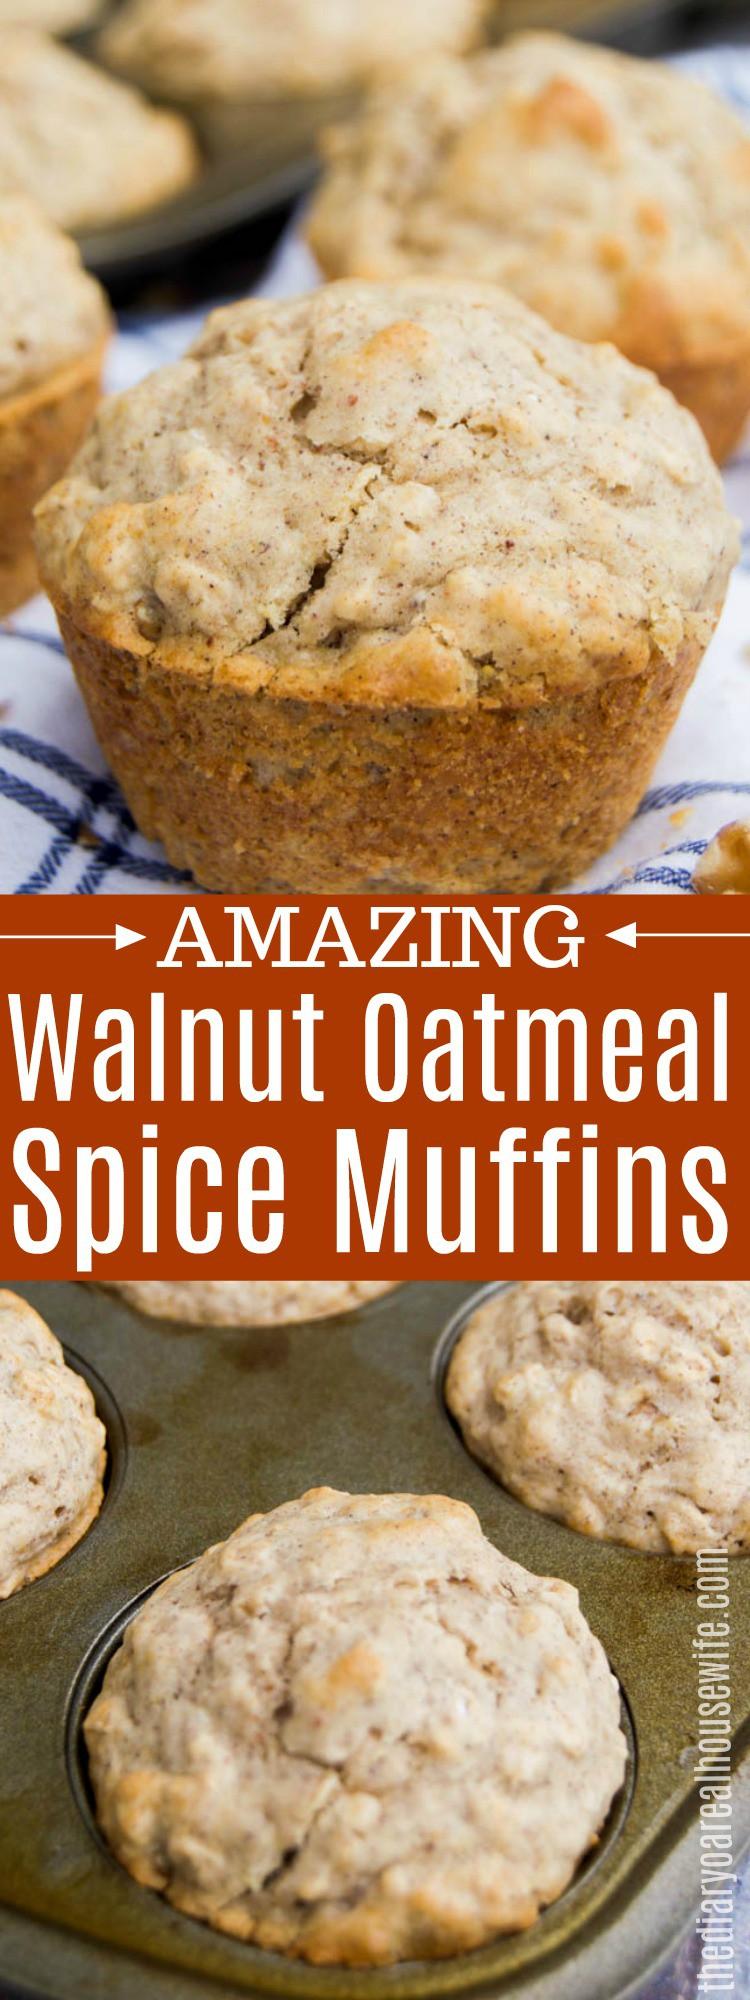 Walnut Oatmeal Spice Muffins